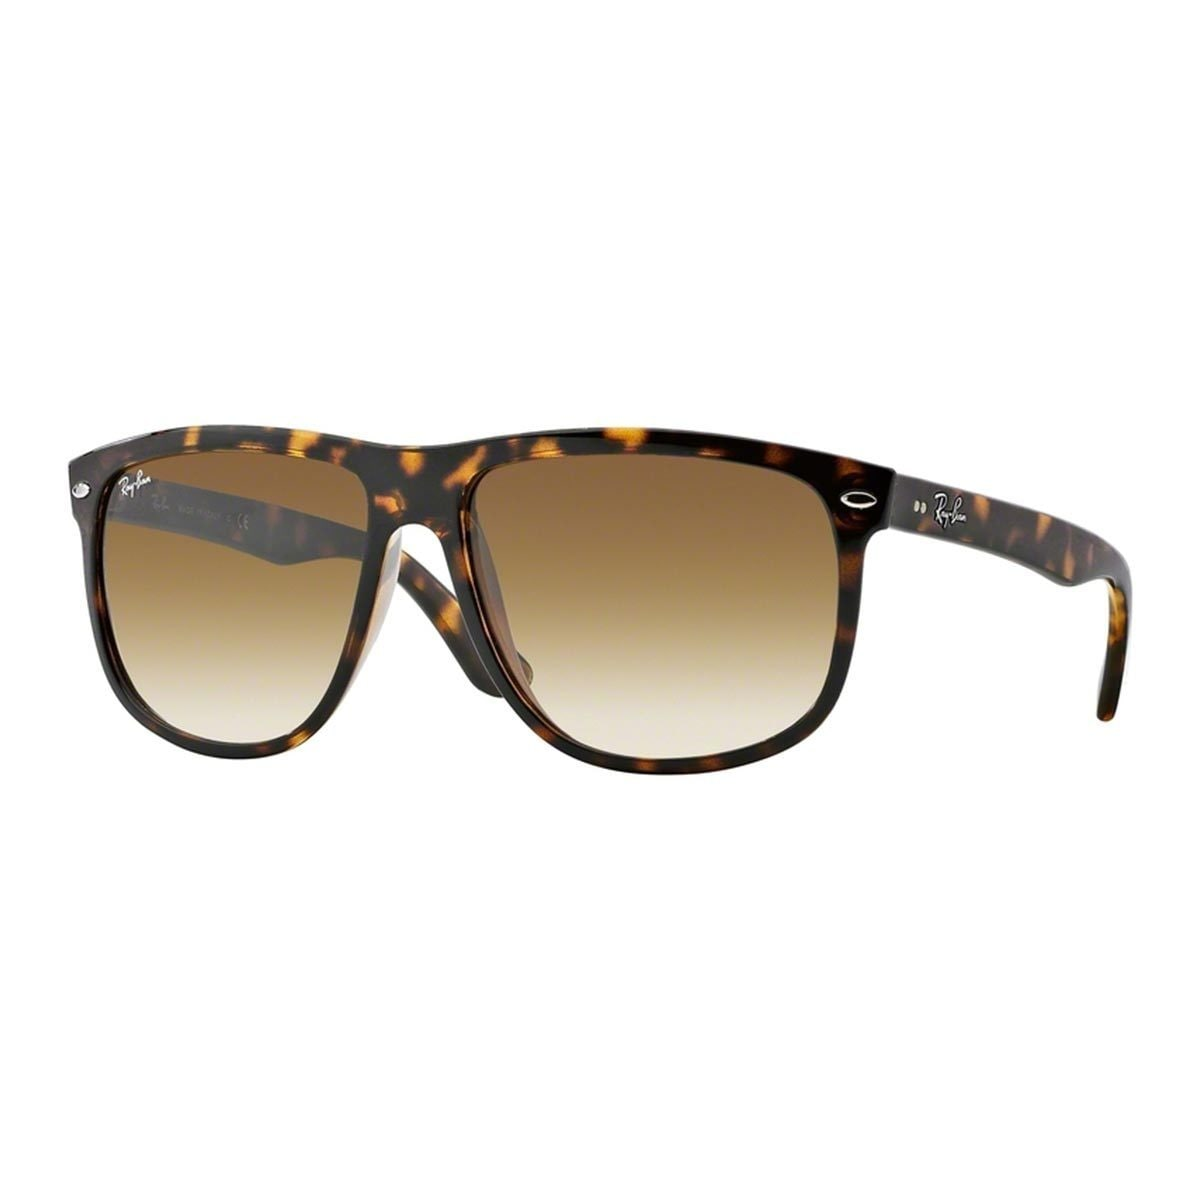 00e3f32a22 Shop Ray-Ban Men s RB4147 60 Tortoise Plastic Square Sunglasses ...